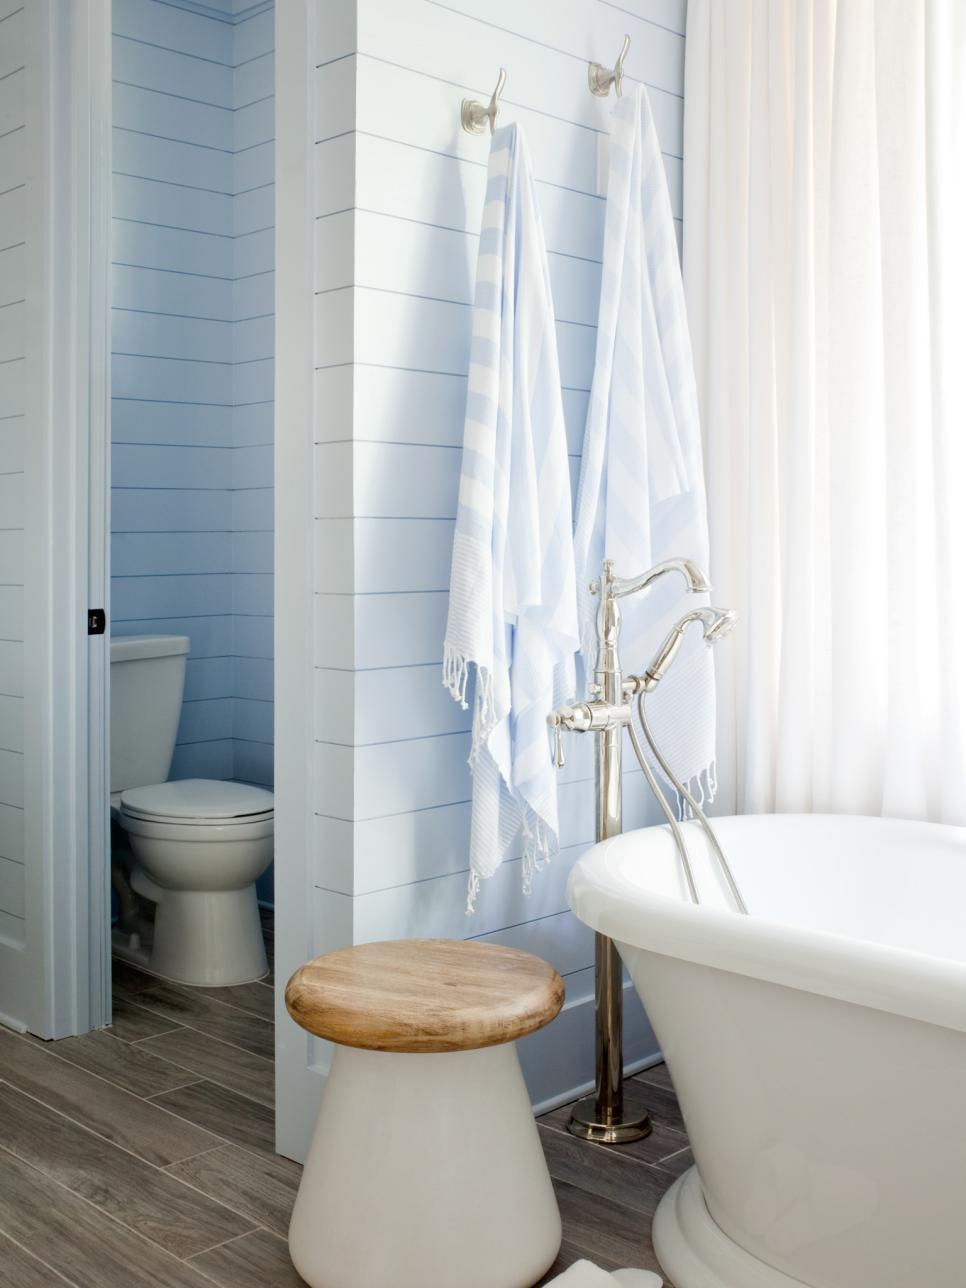 Hgtv Dream Home 2017 Master Bathroom Pictures Hgtv Dream Home 2017 Hgtv